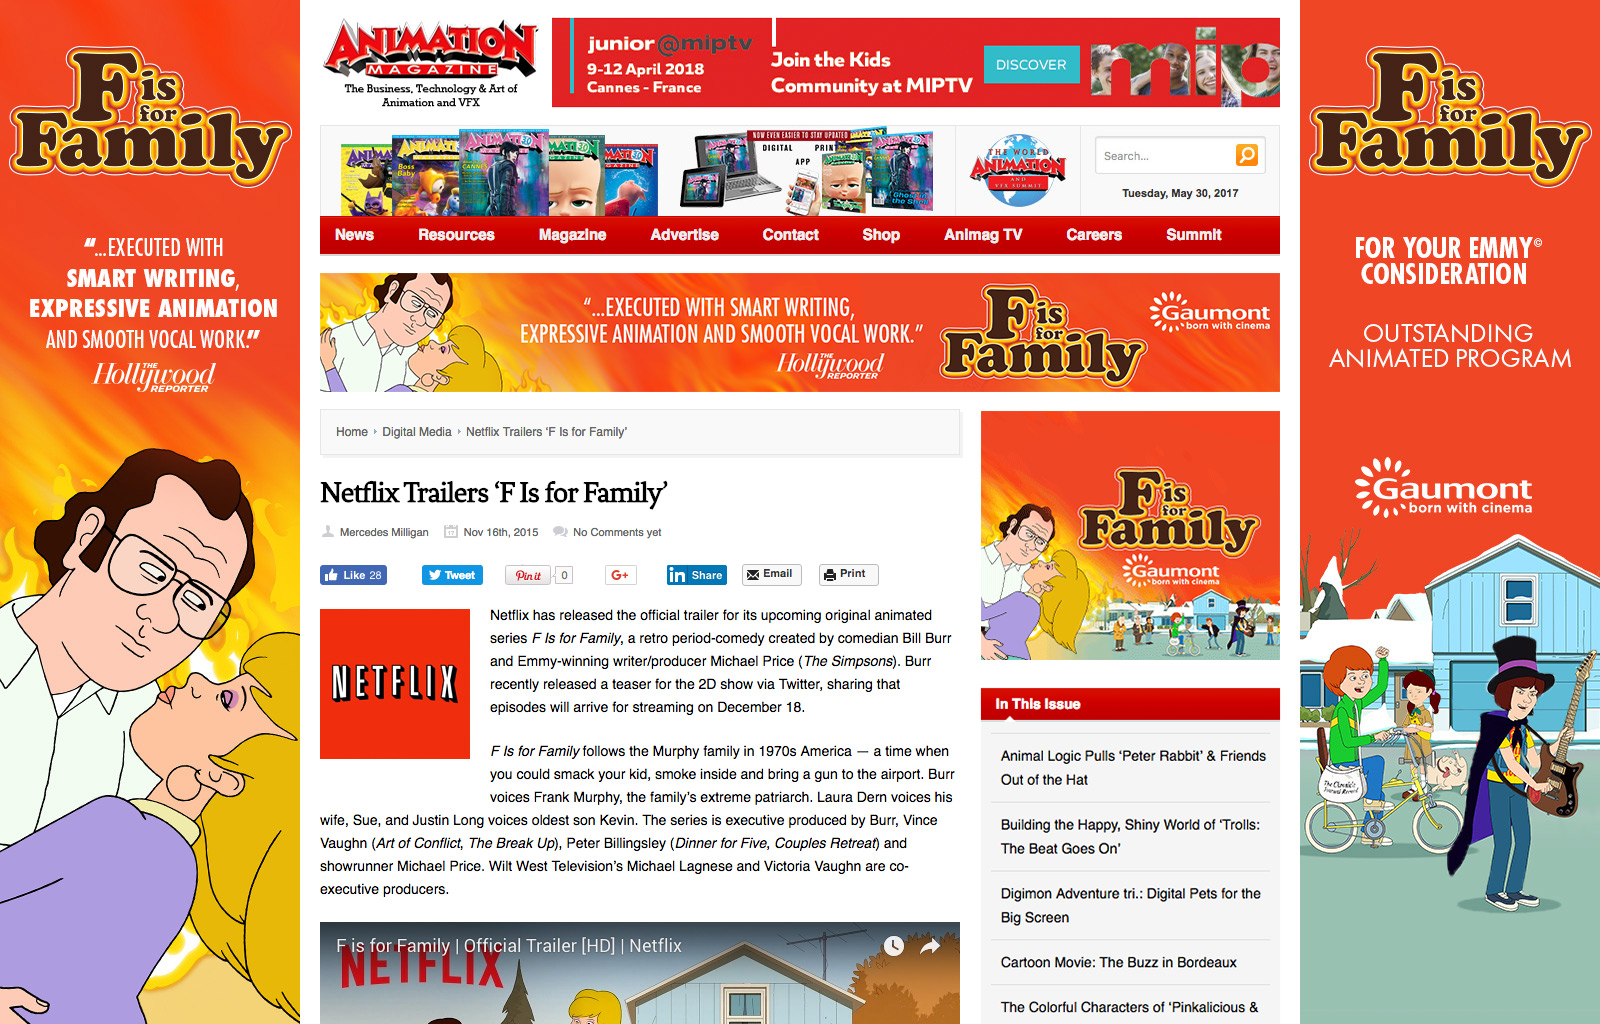 Animation Magazine - Takeover